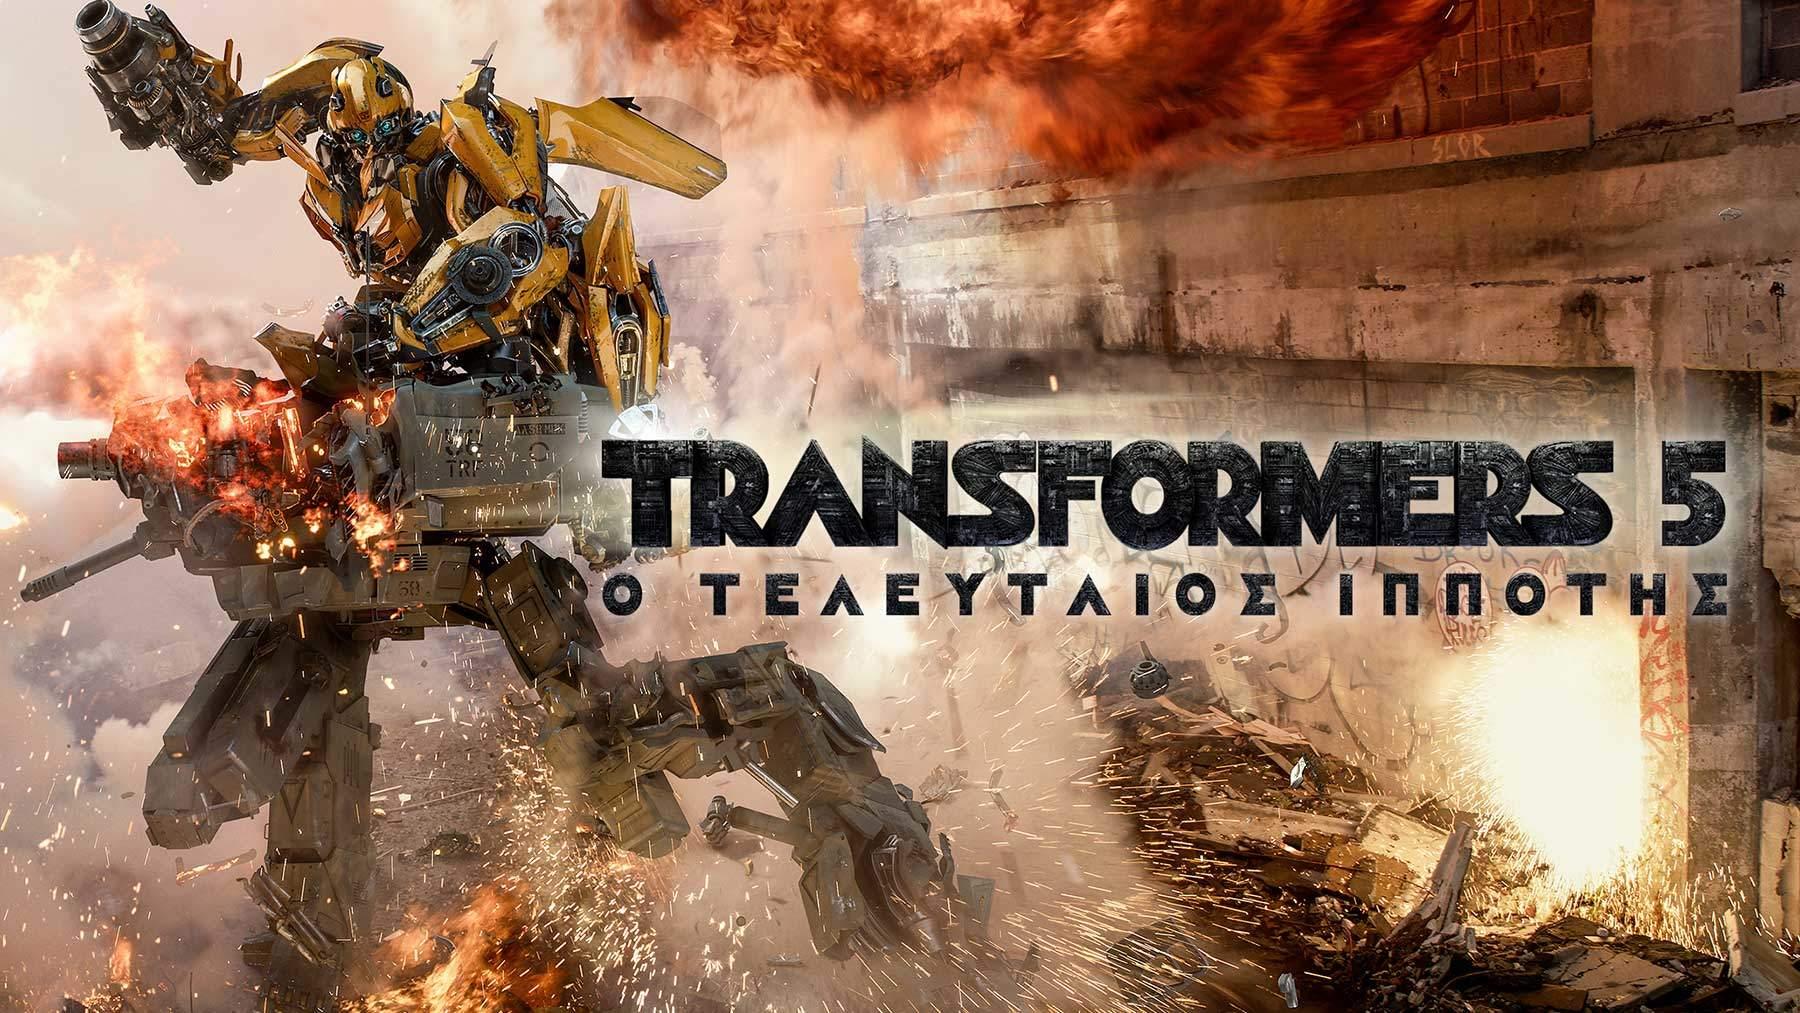 Transformers The Last Knight Greek title design for Netflix